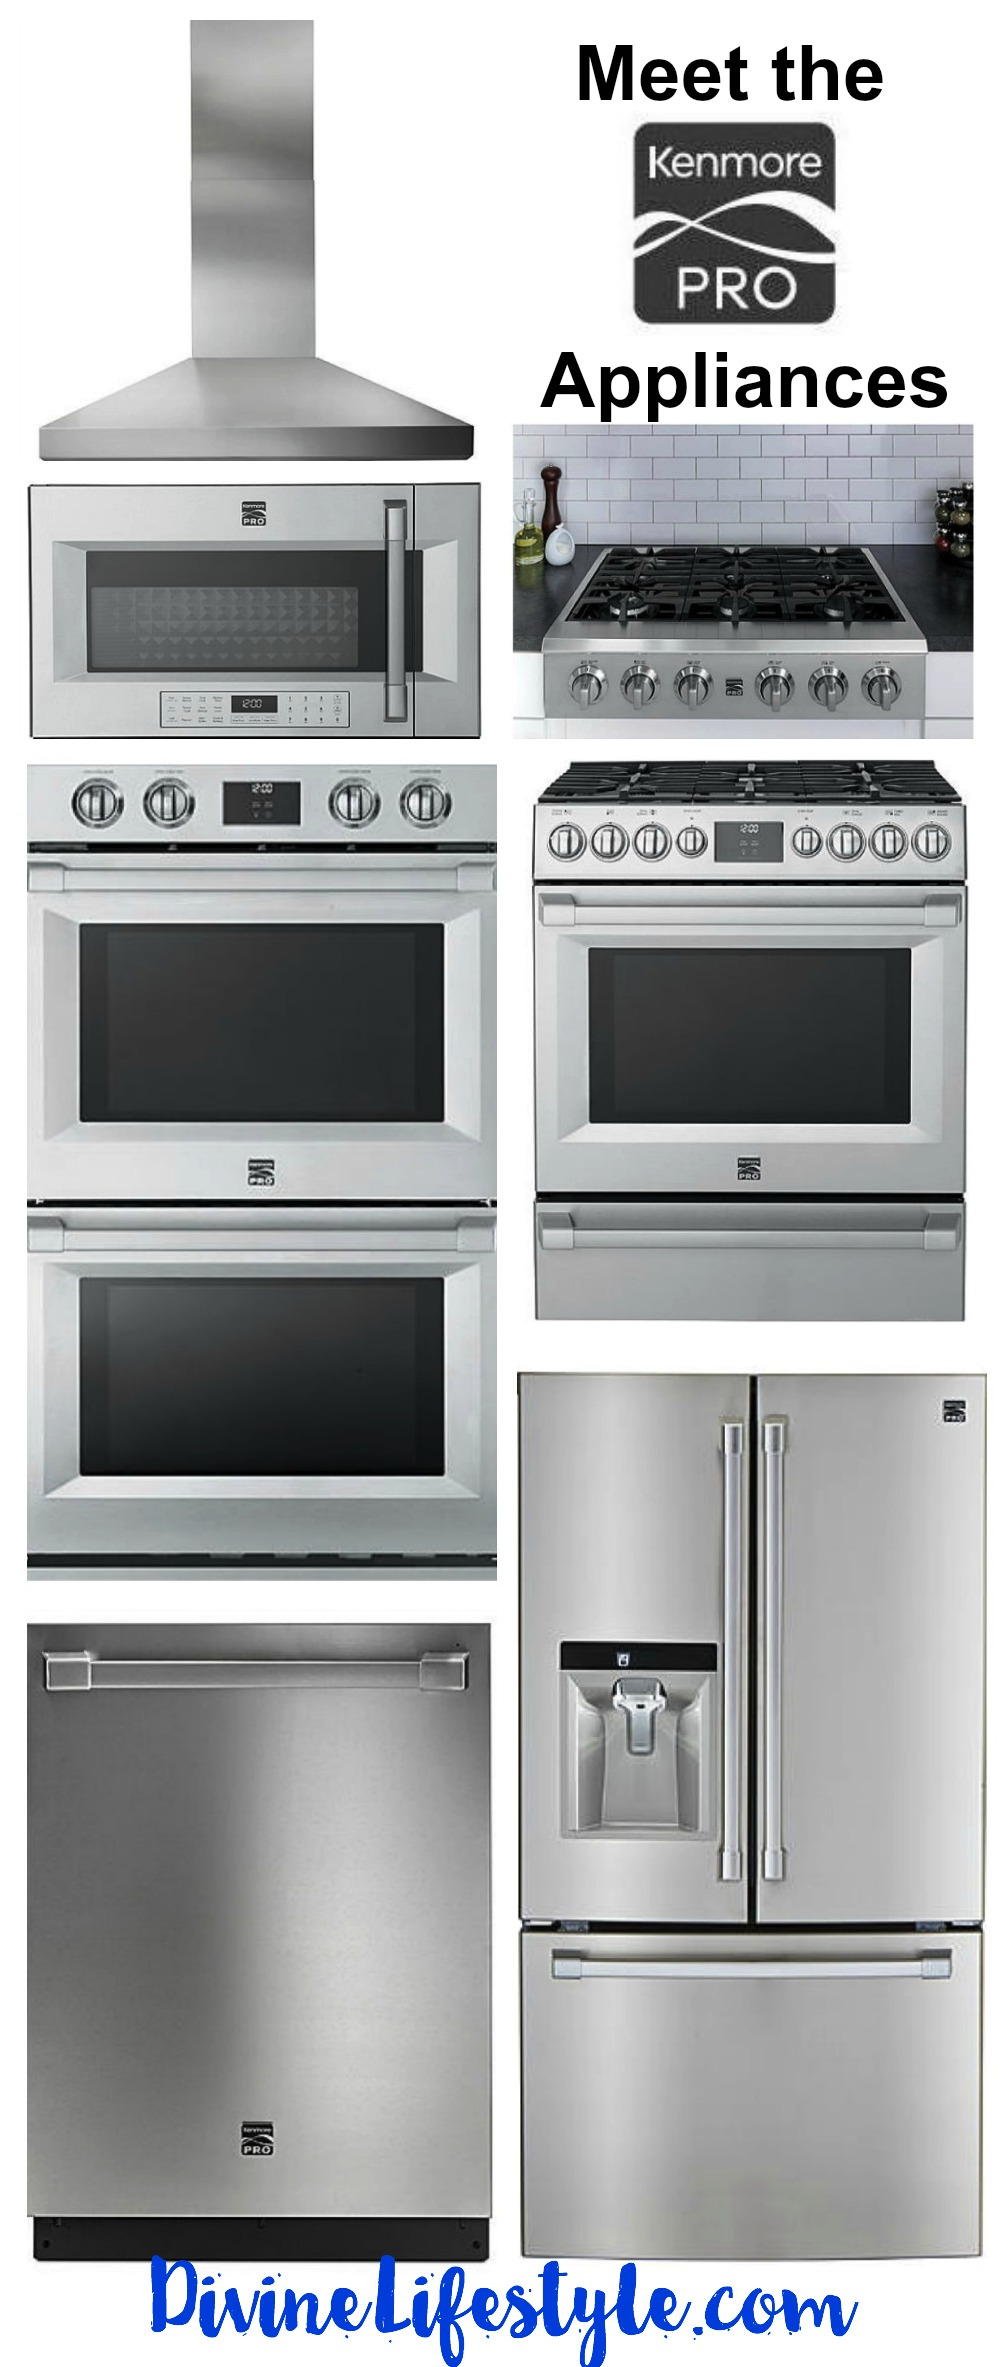 kenmore appliances. tracking pixel kenmore pro appliances s